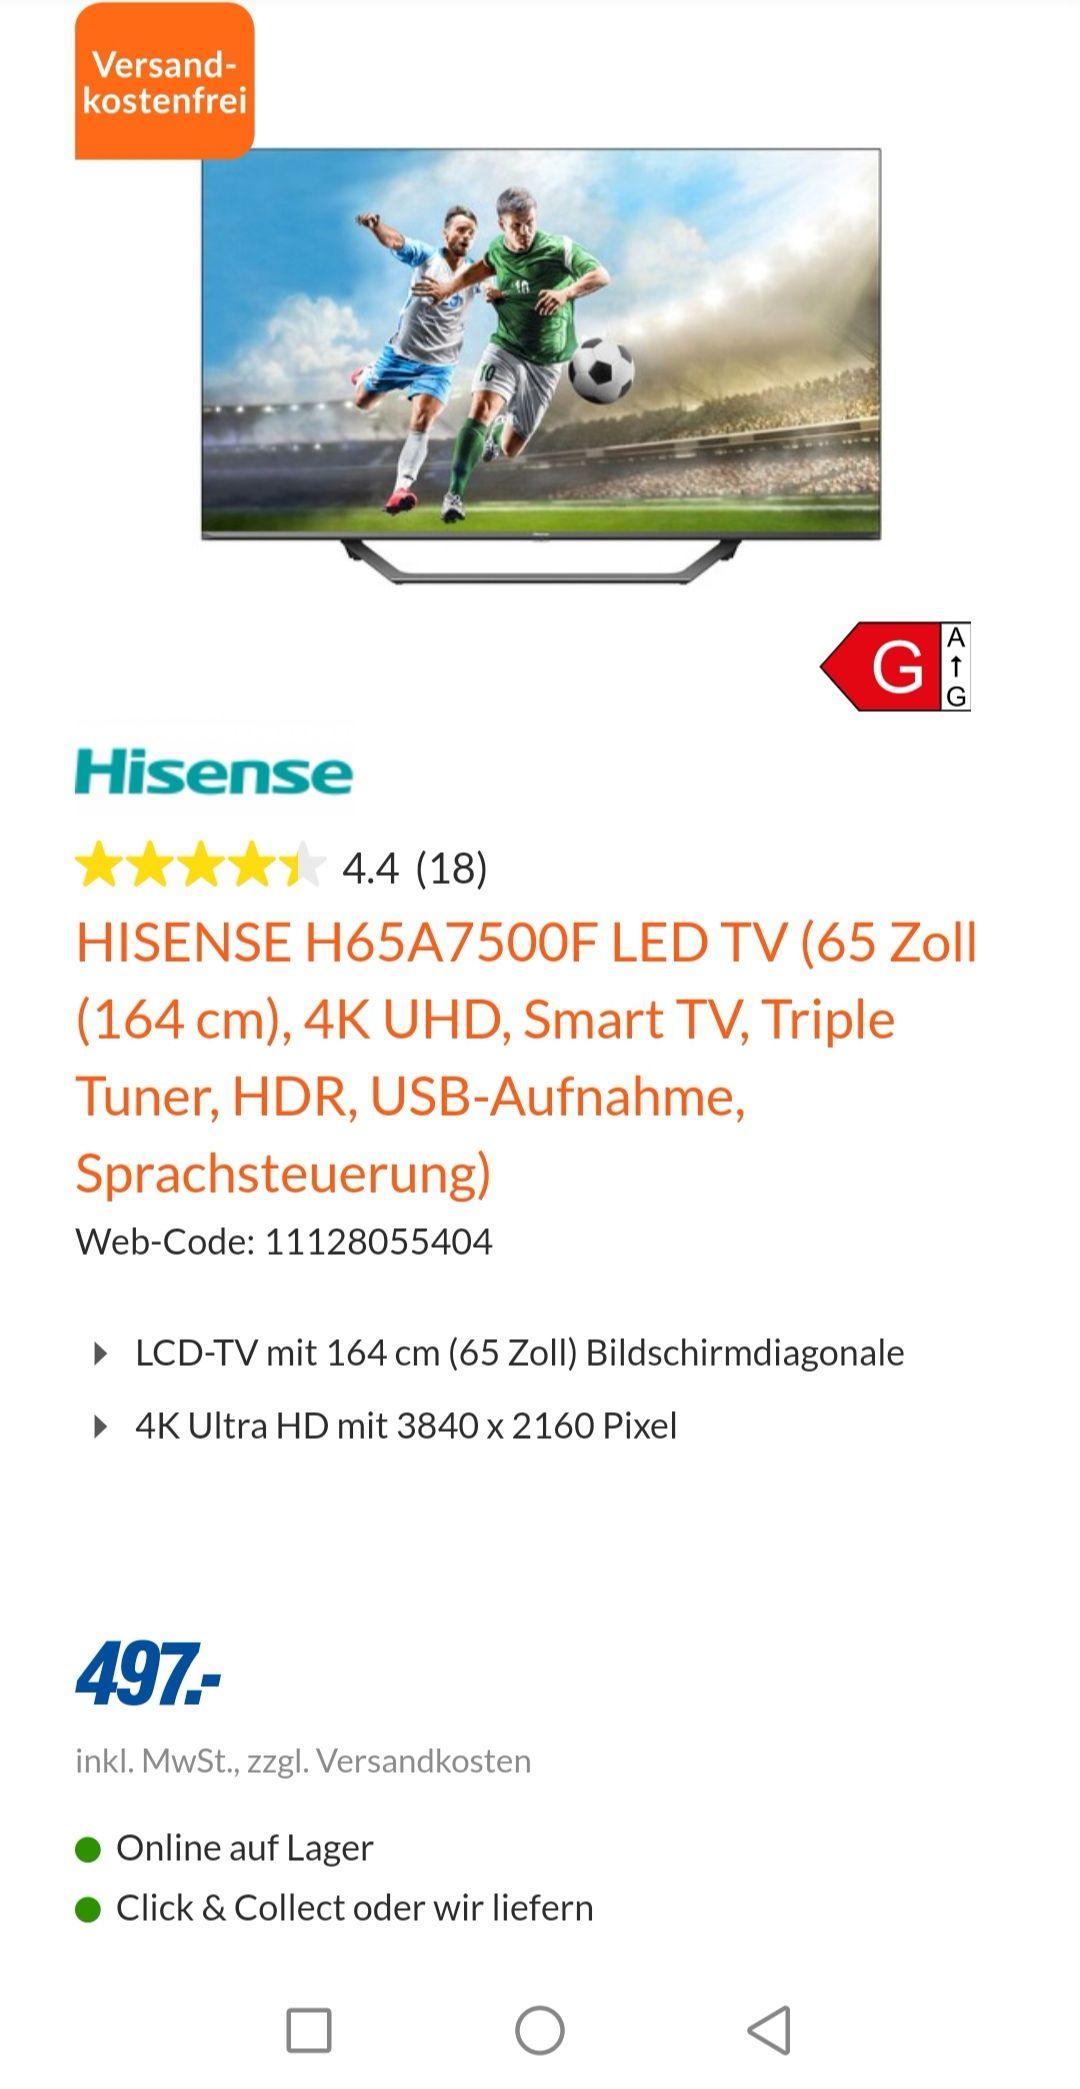 Hisense H65A7500F LED TV Expert Bielinsky